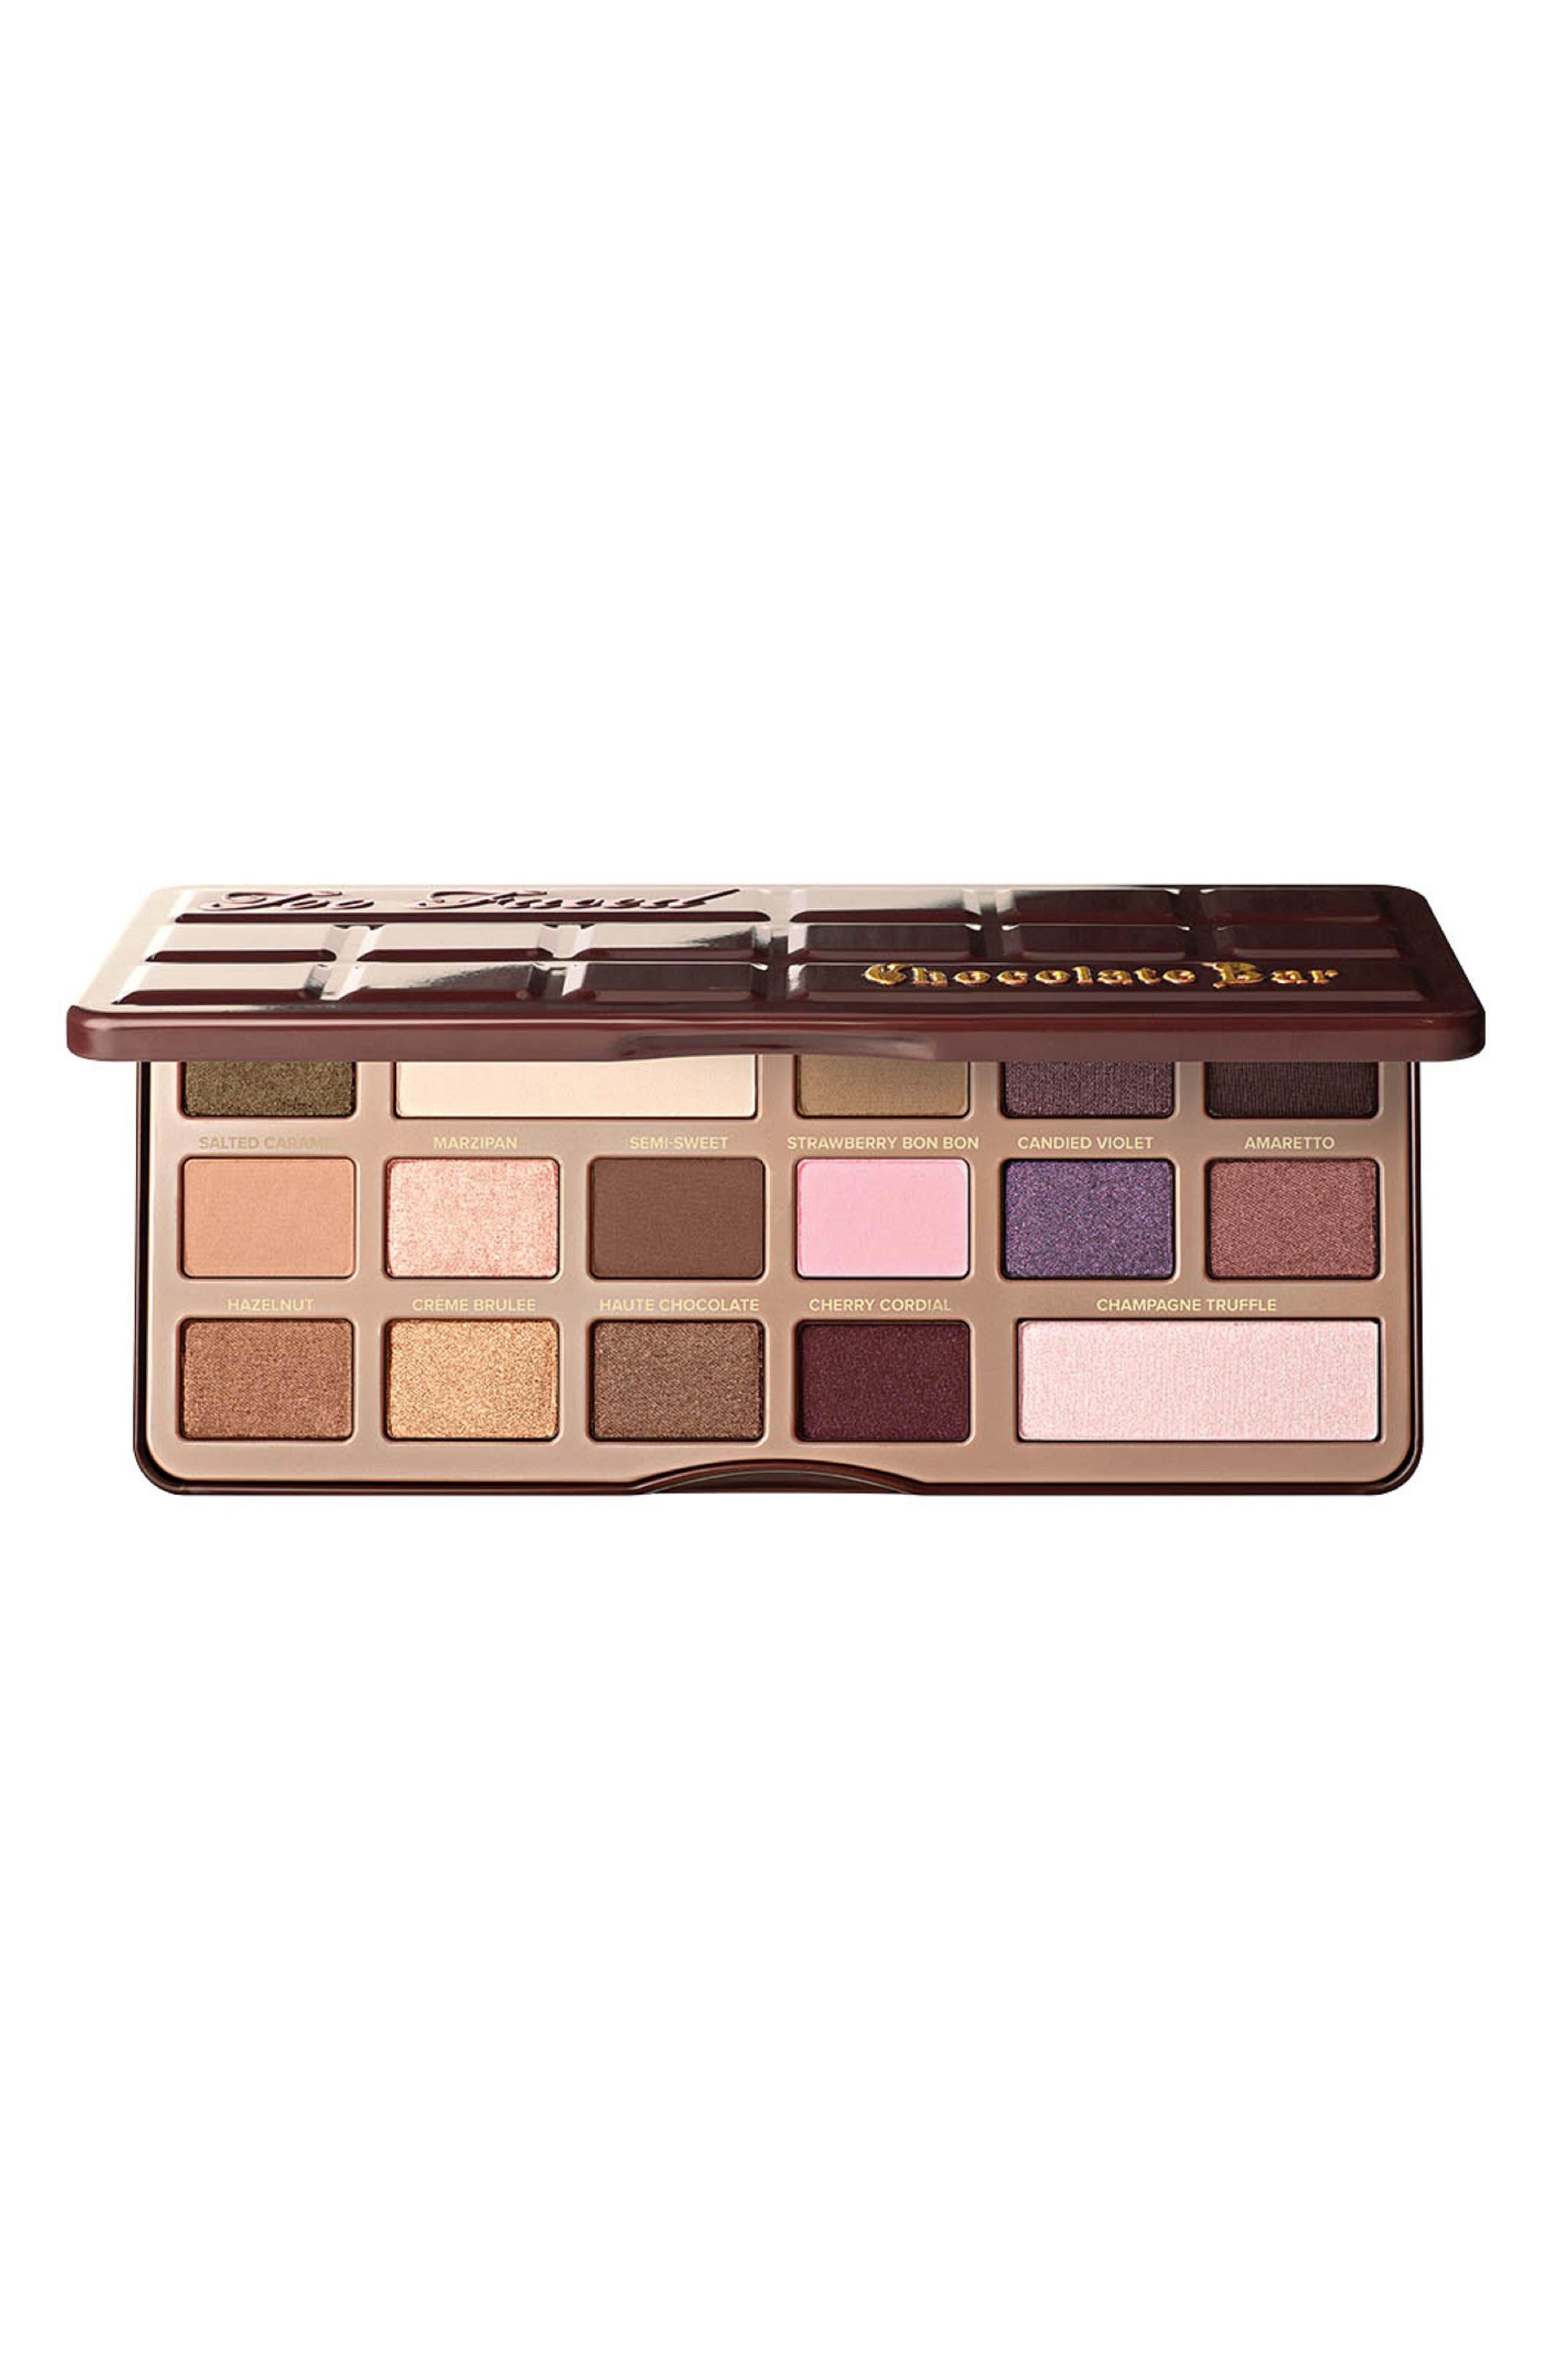 Main Image - Too Faced Chocolate Bar Eyeshadow Palette